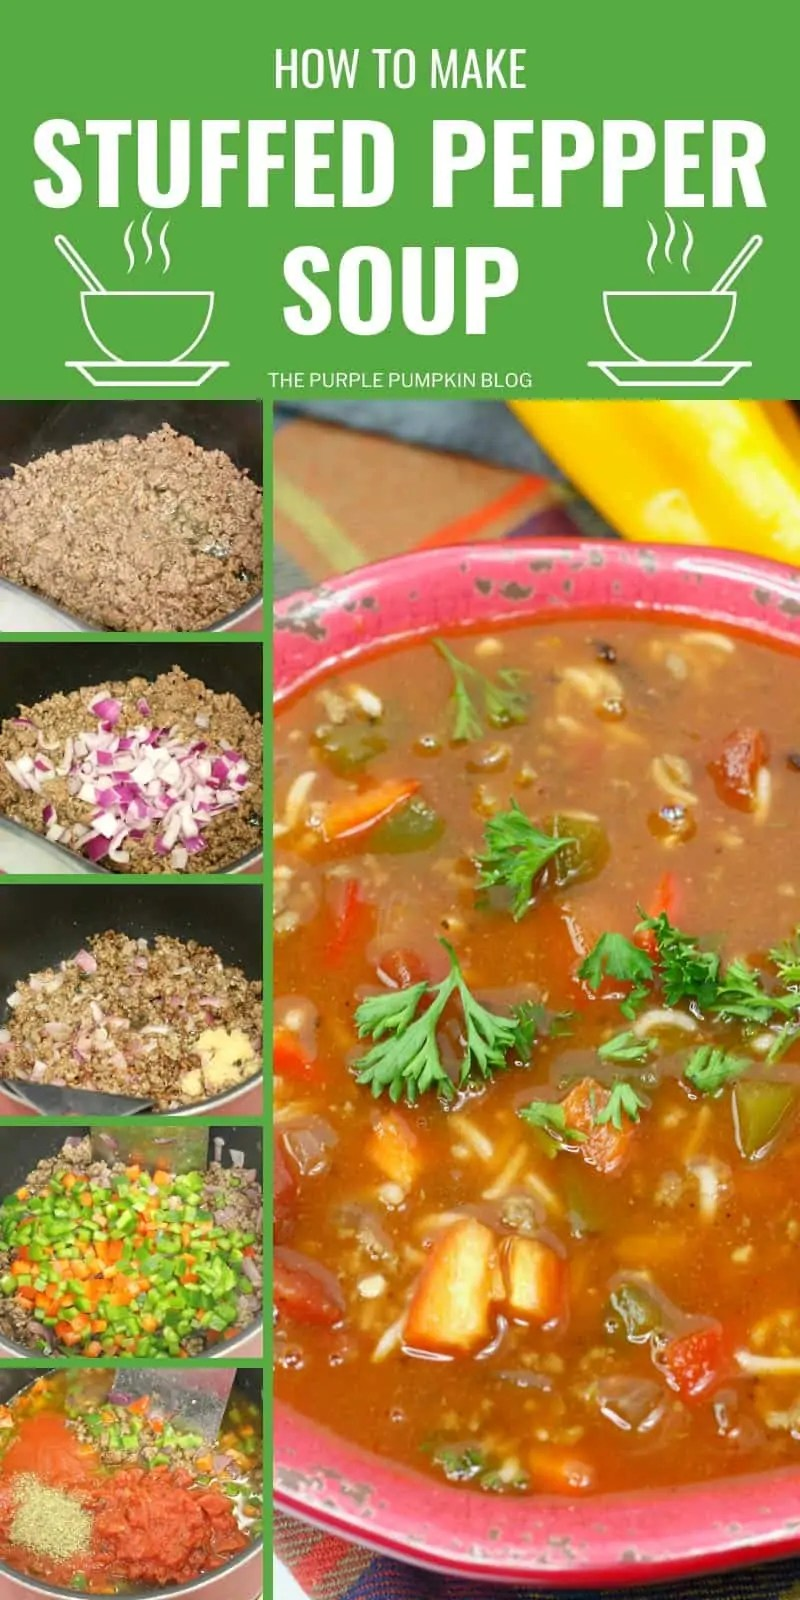 How to make stuffed pepper soup